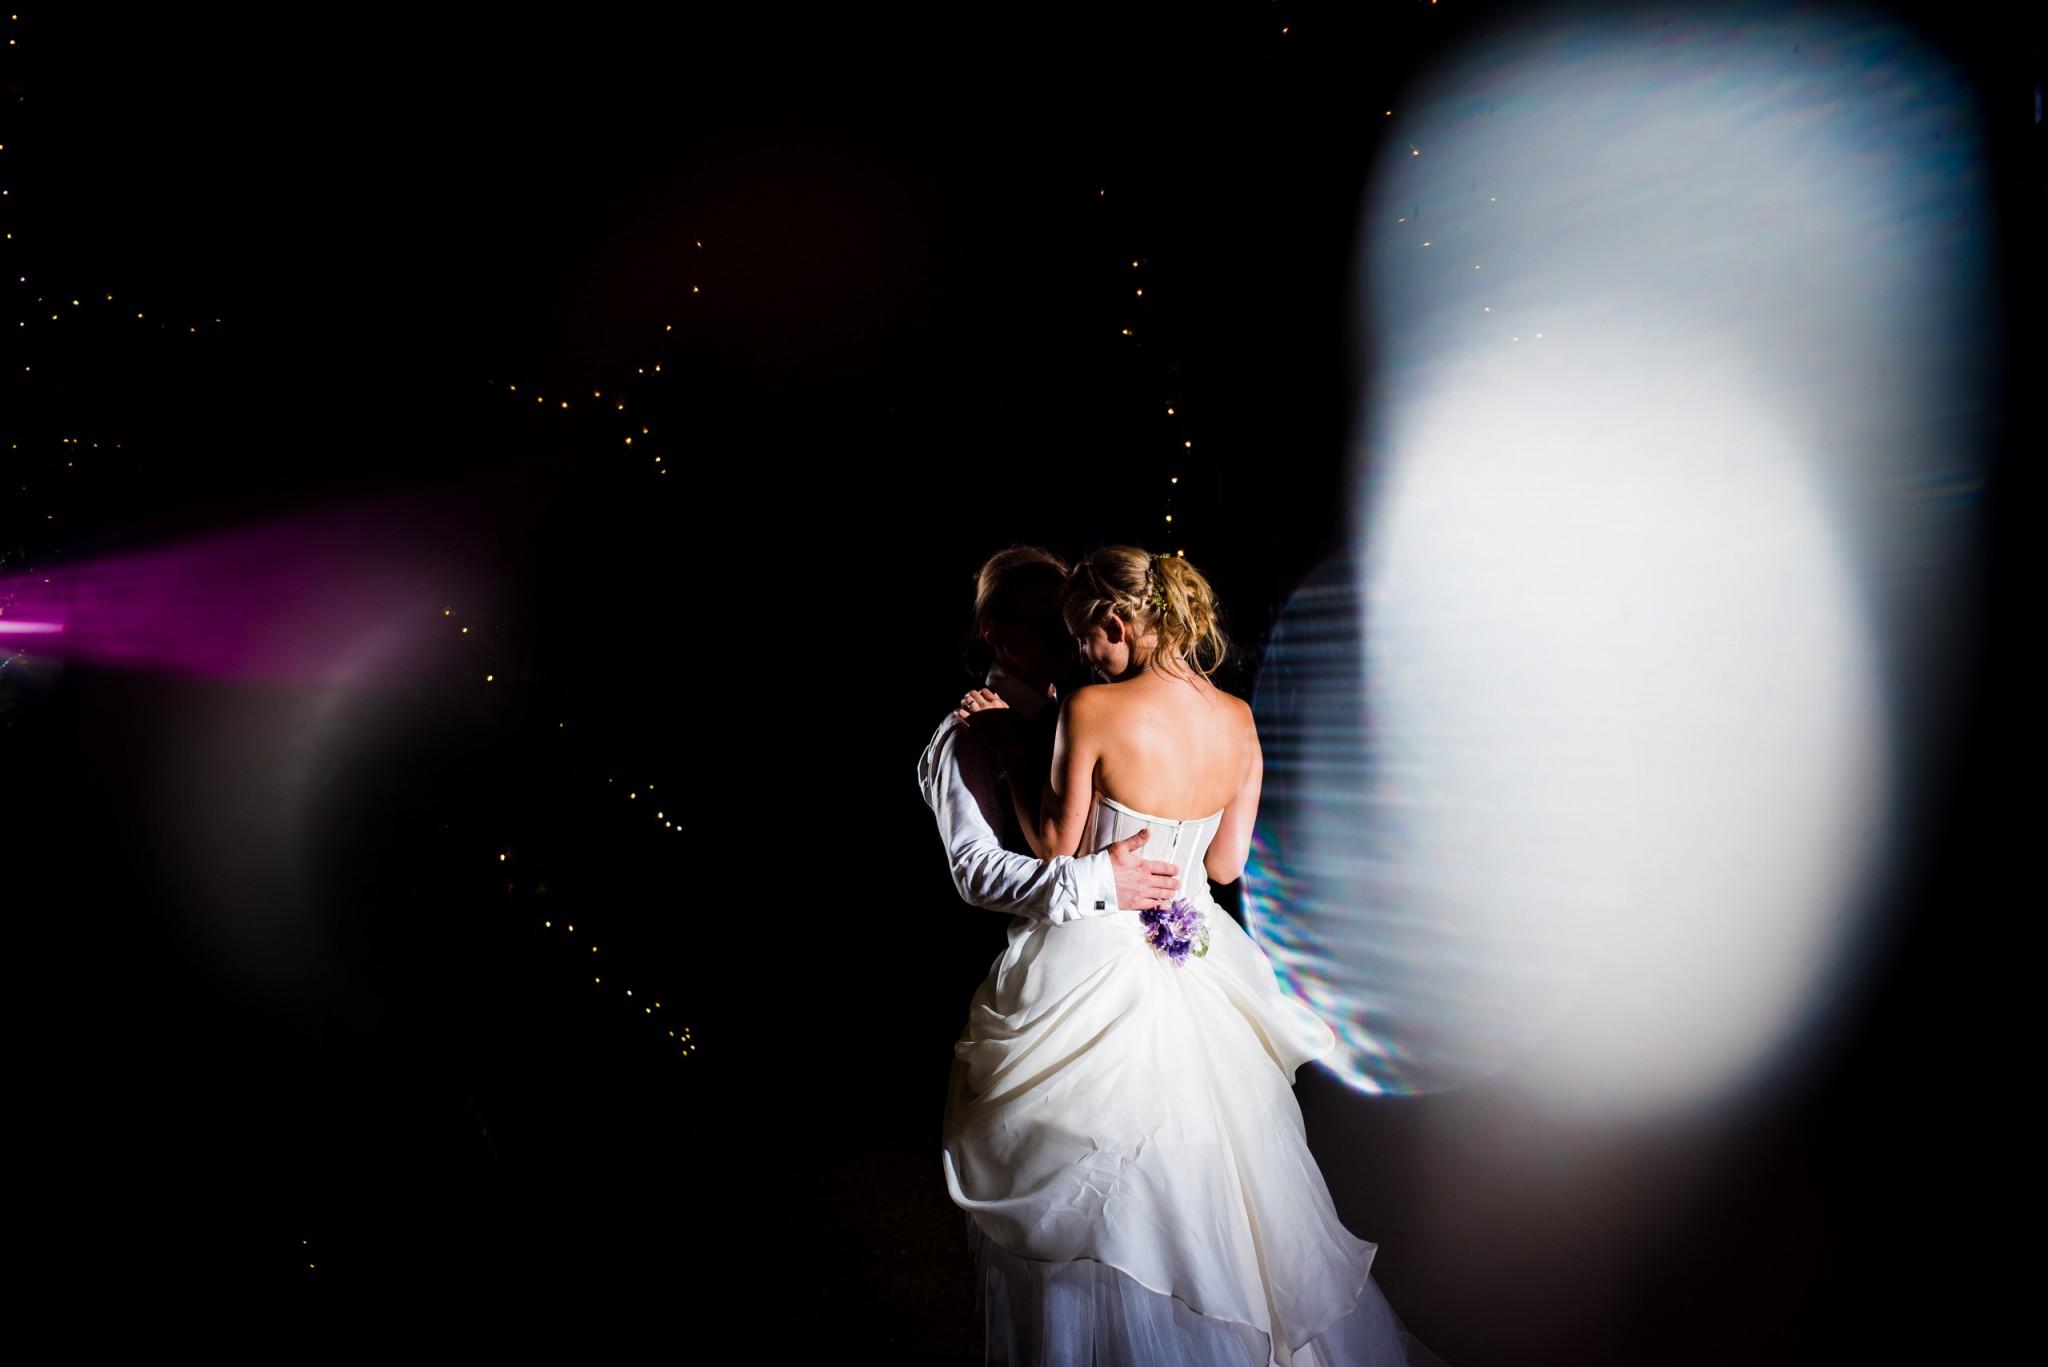 Hochzeitsfotograf-Frankfurt-160731-013019-2669